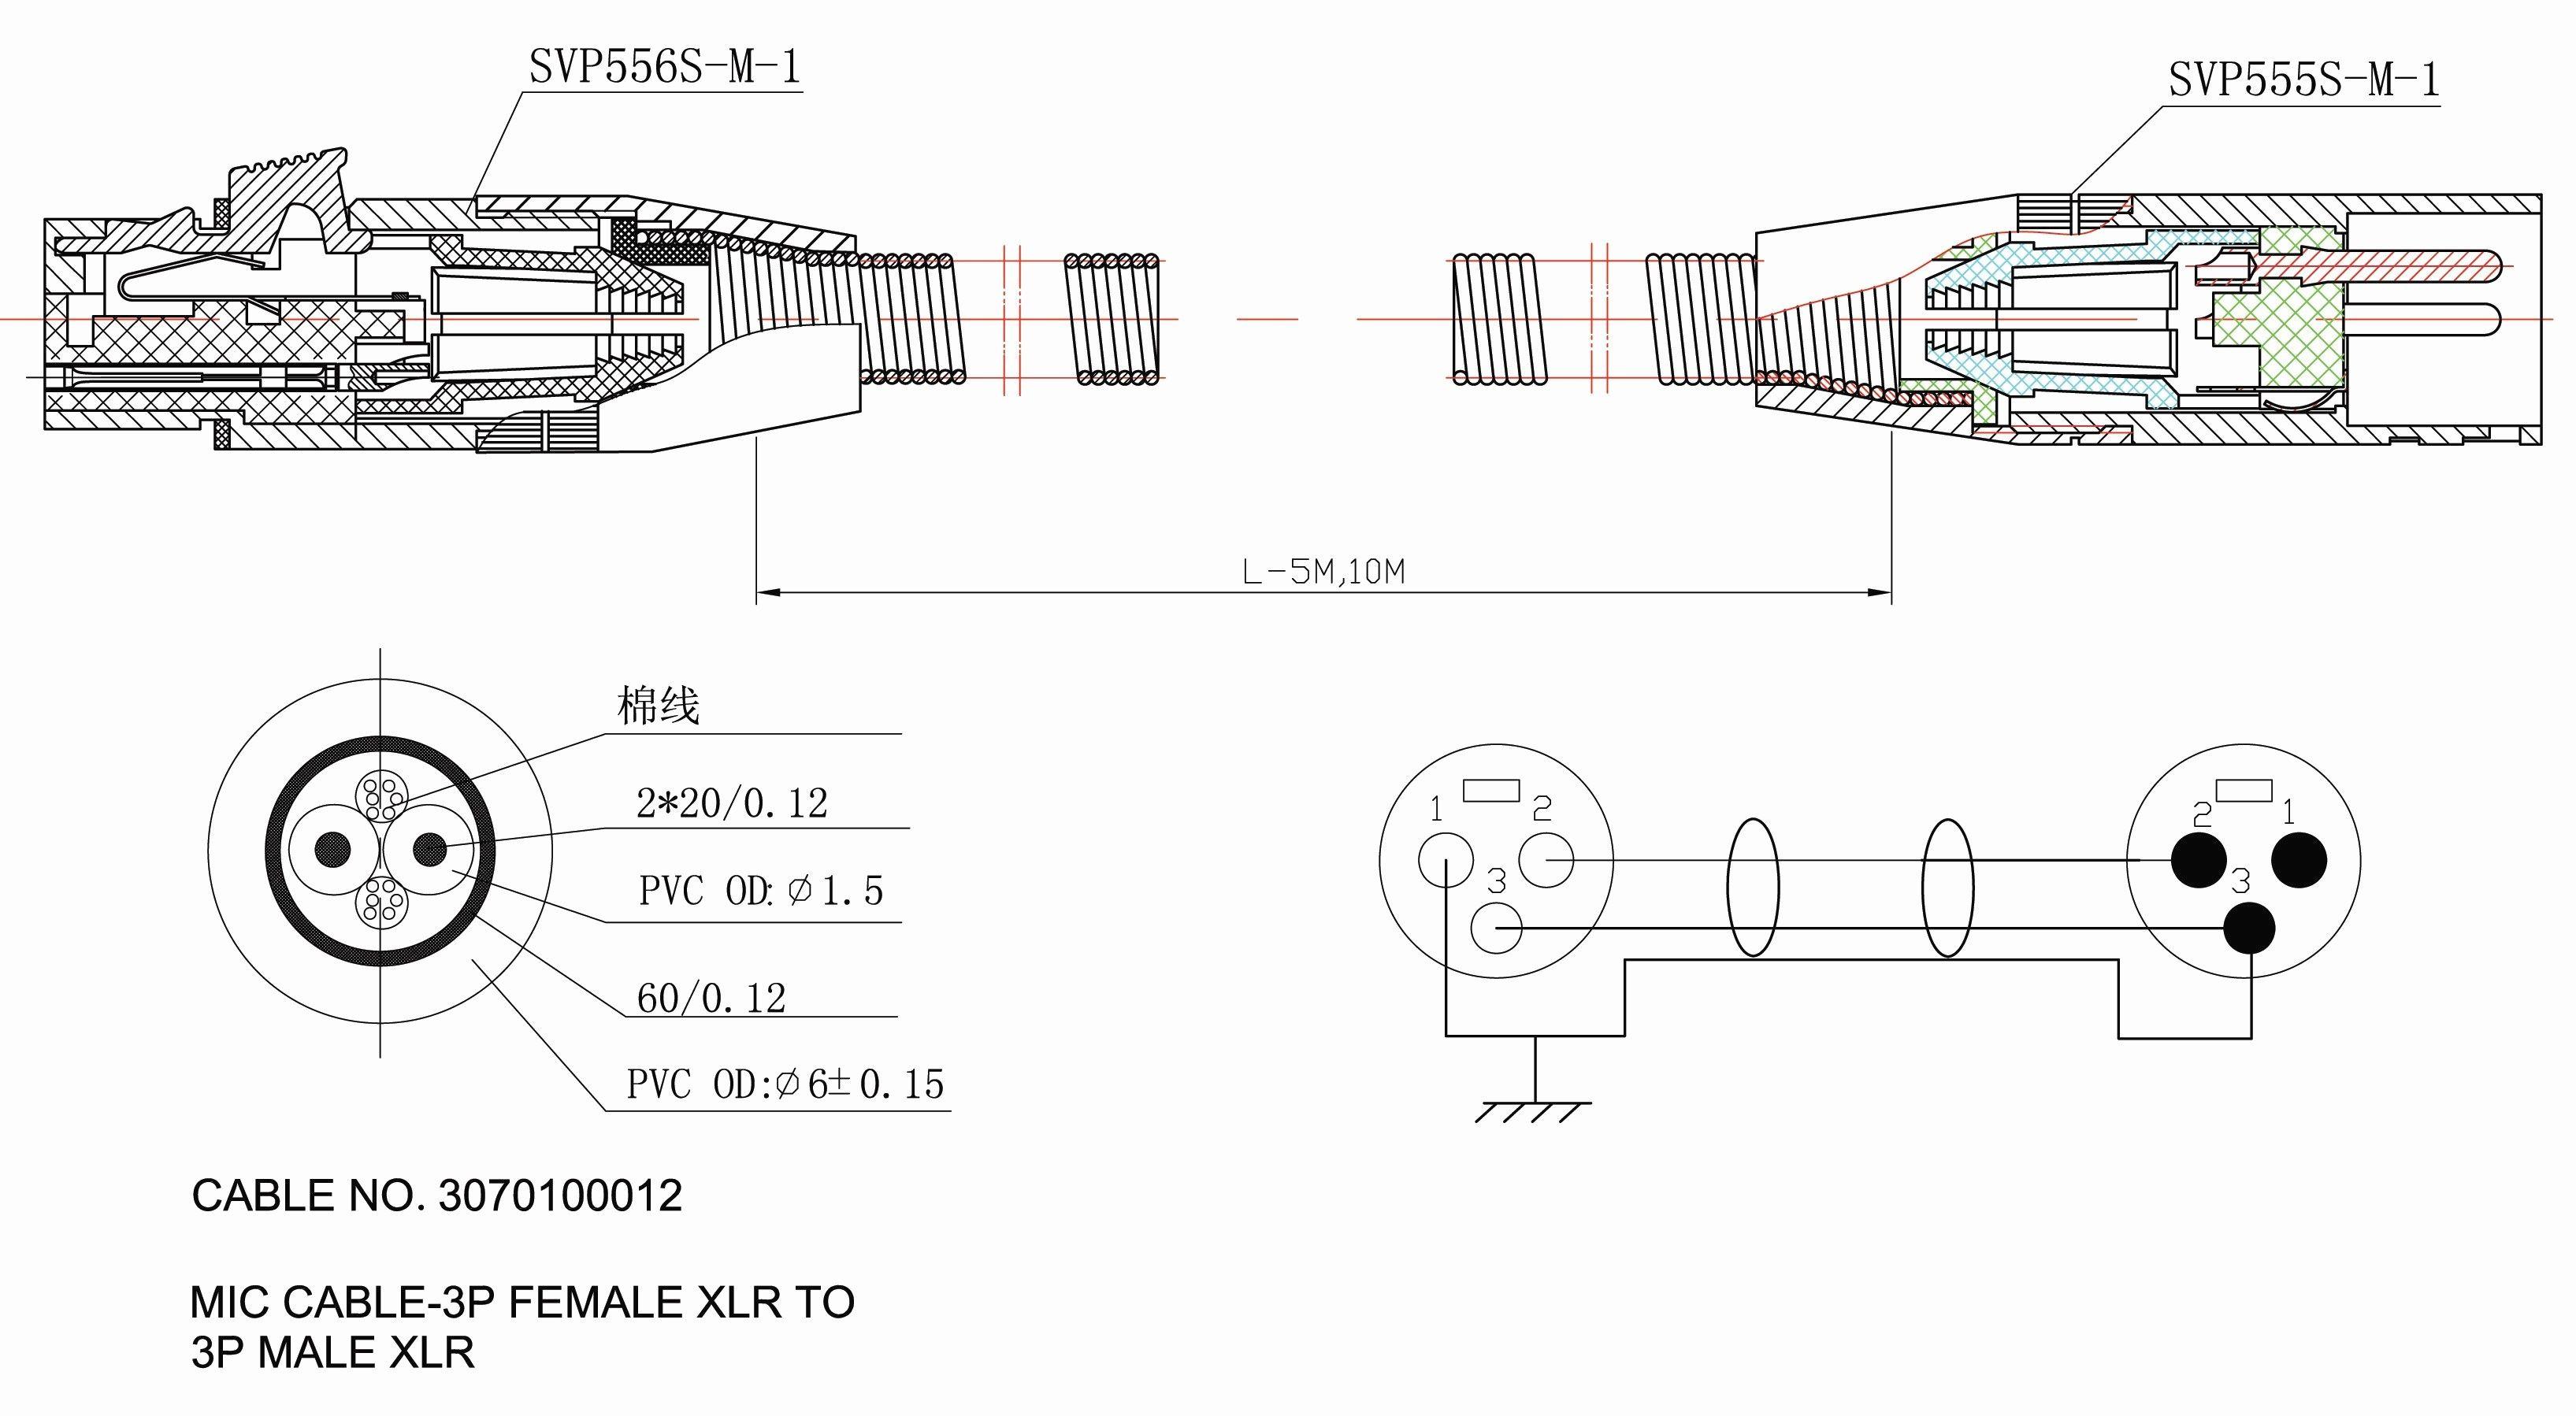 The Best 24 Smart Home Wiring Diagram Https Bacamajalah Com The Best 24 Smart Home Wiring Diagram With Images Electrical Wiring Diagram Door Repair Baseboard Heater